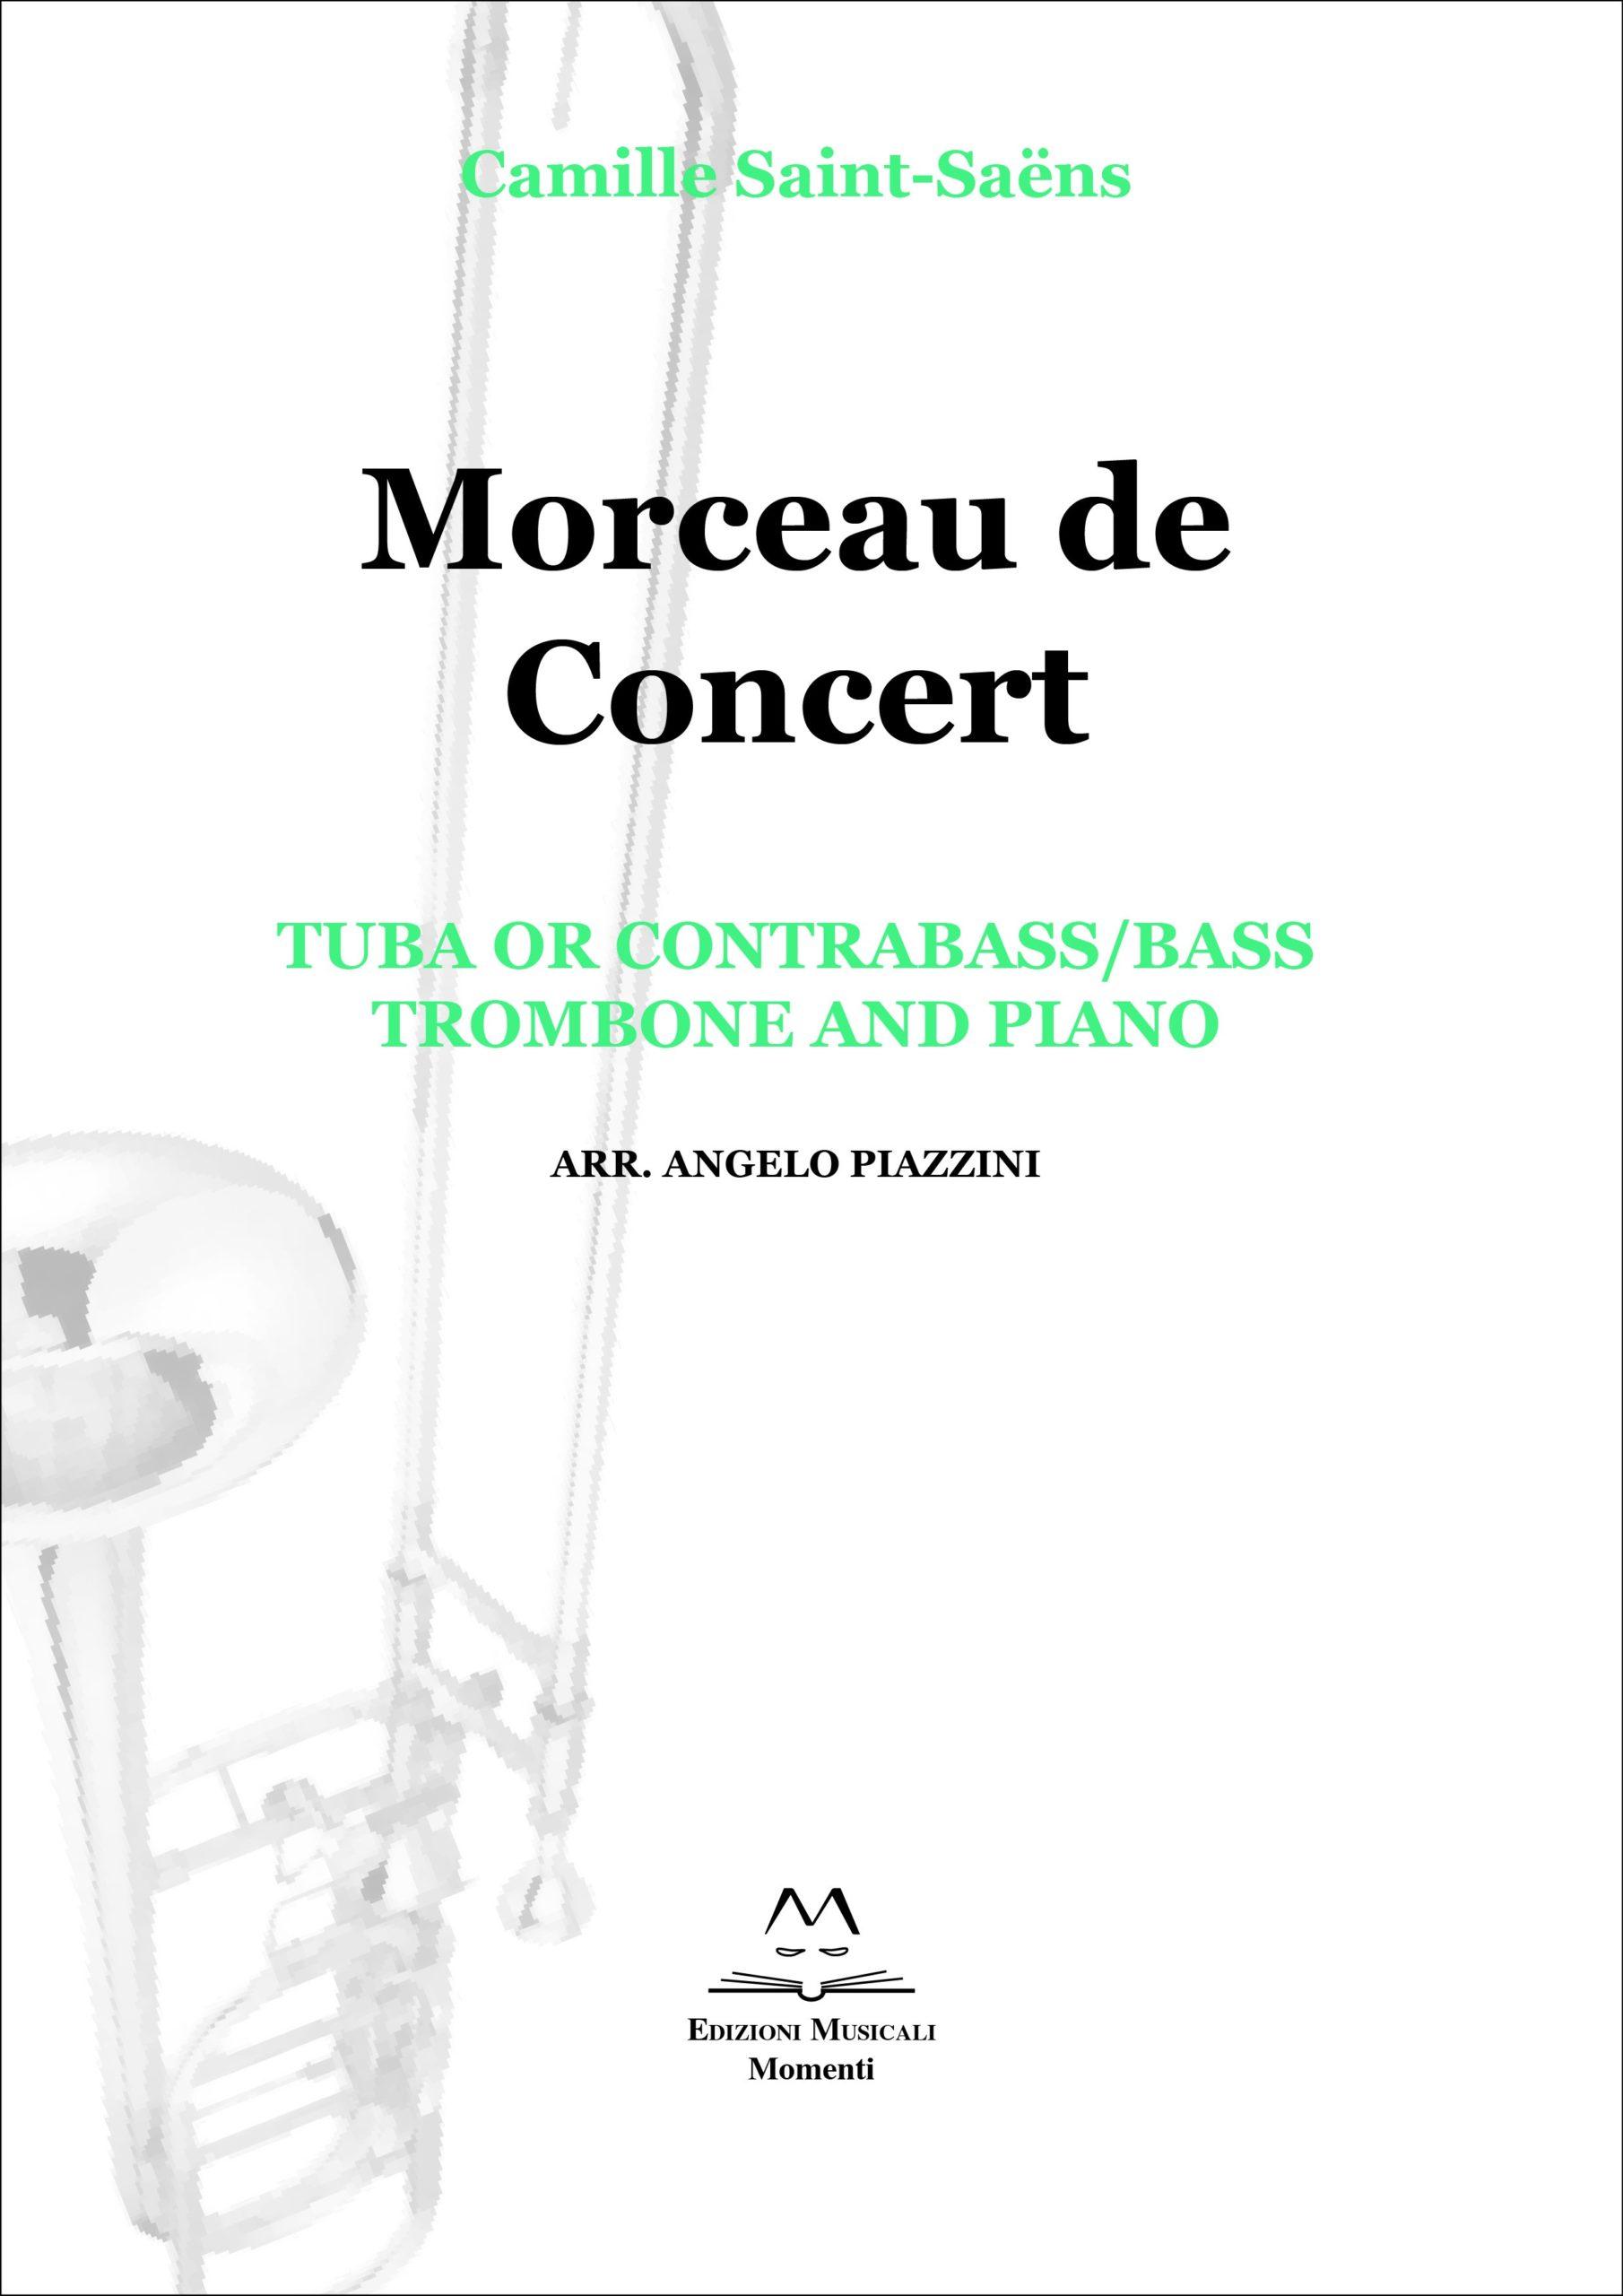 Morceau de Concert - Tuba or contrabass/bass, trombone and piano arr. Angelo Piazzini